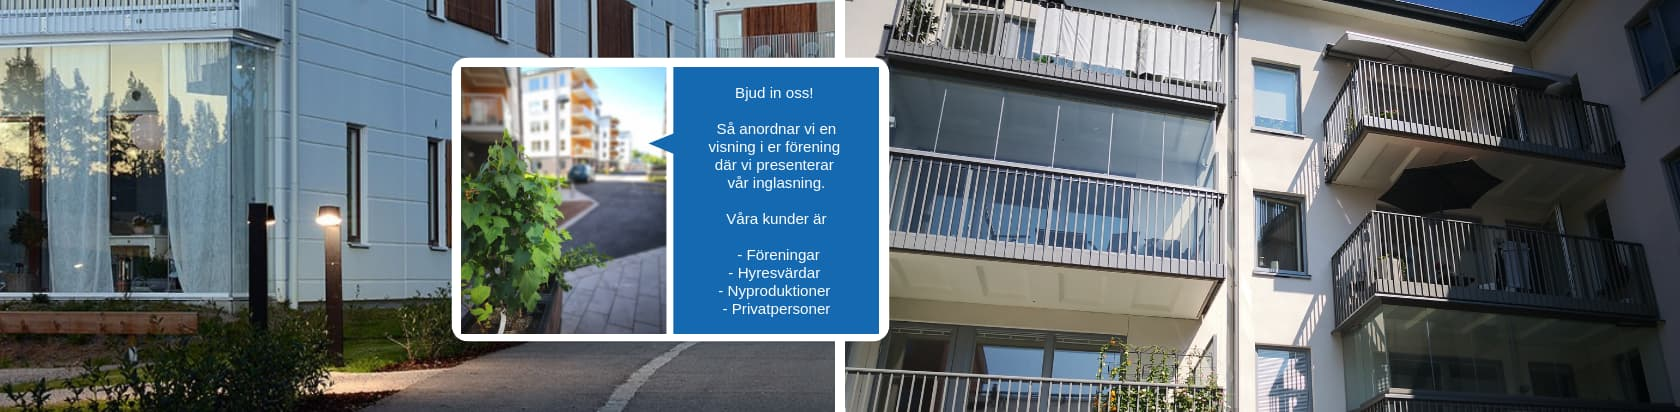 Försäljning NIKA Inglasning AB - Stockholm, Sverige